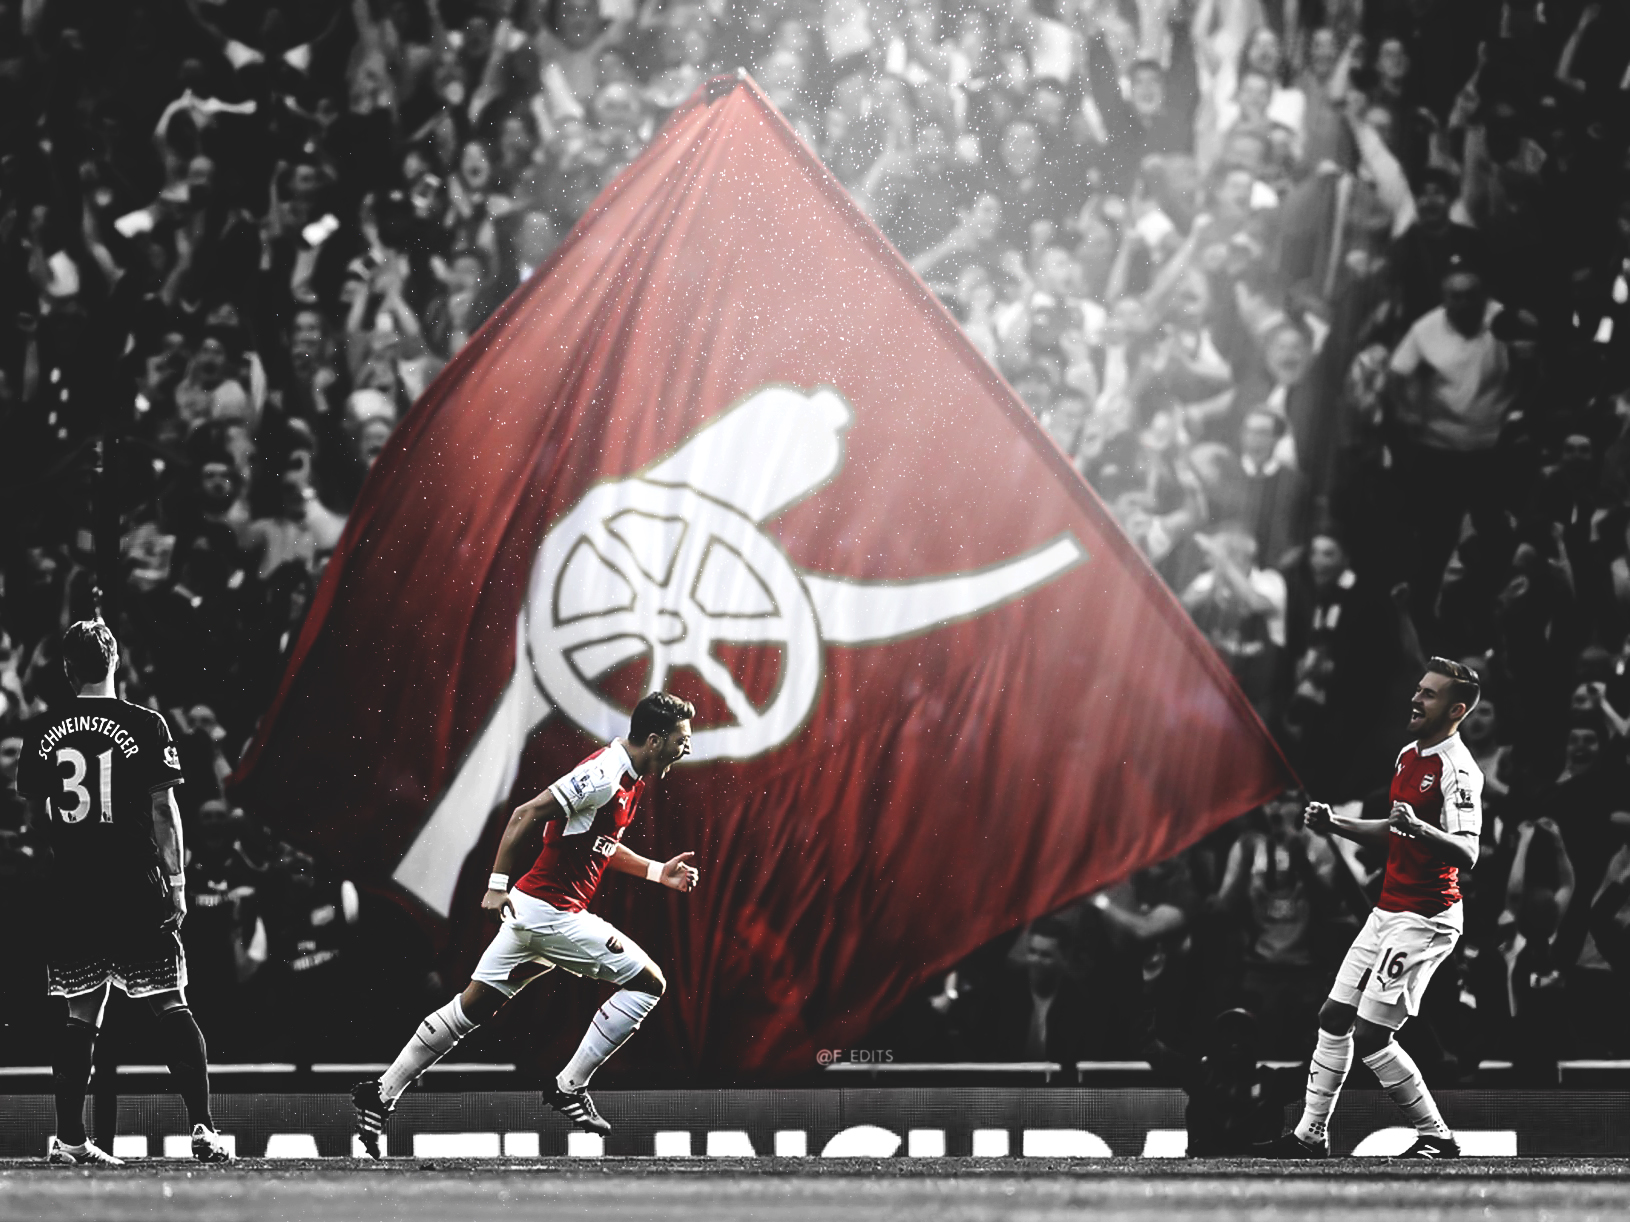 Arsenal Vs Manchester United Desktop Wallpaper By F Edits On Deviantart